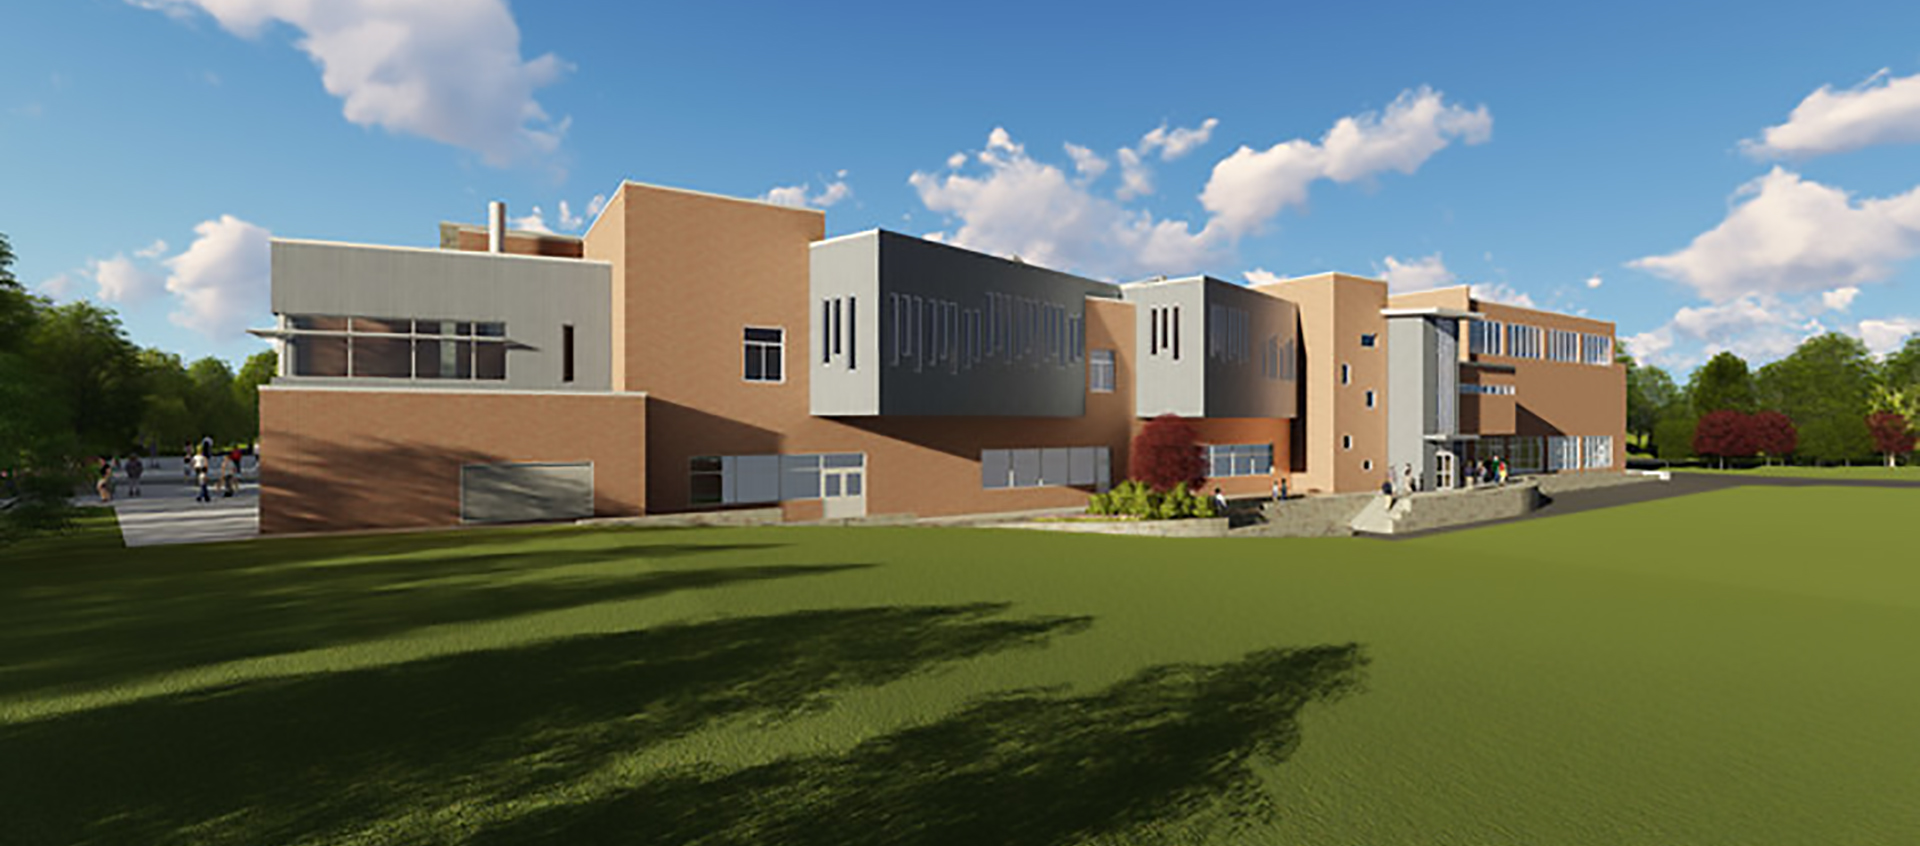 New Paltz Middle School - rendering